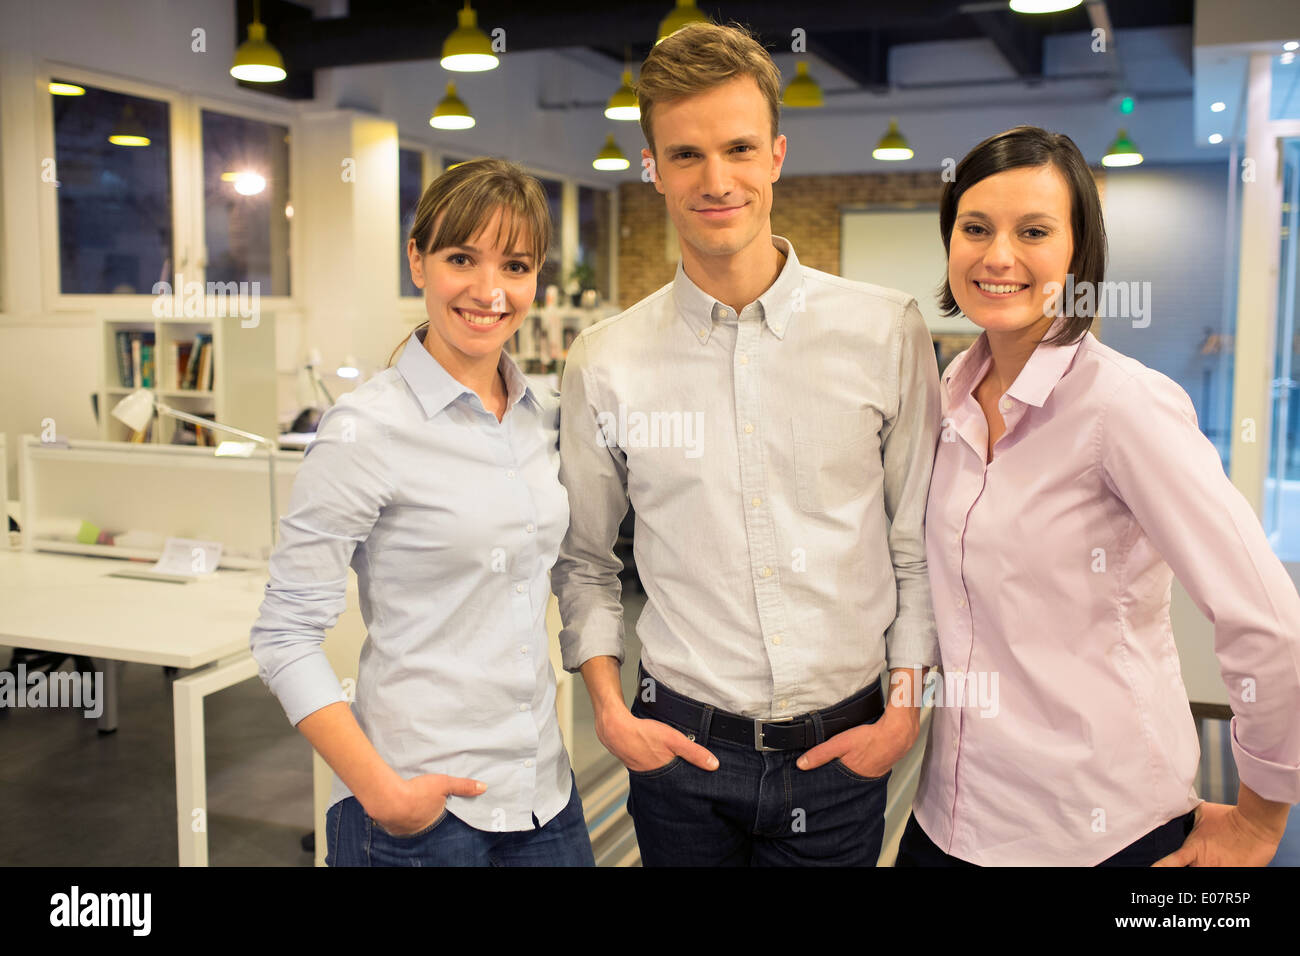 Women man business team office - Stock Image